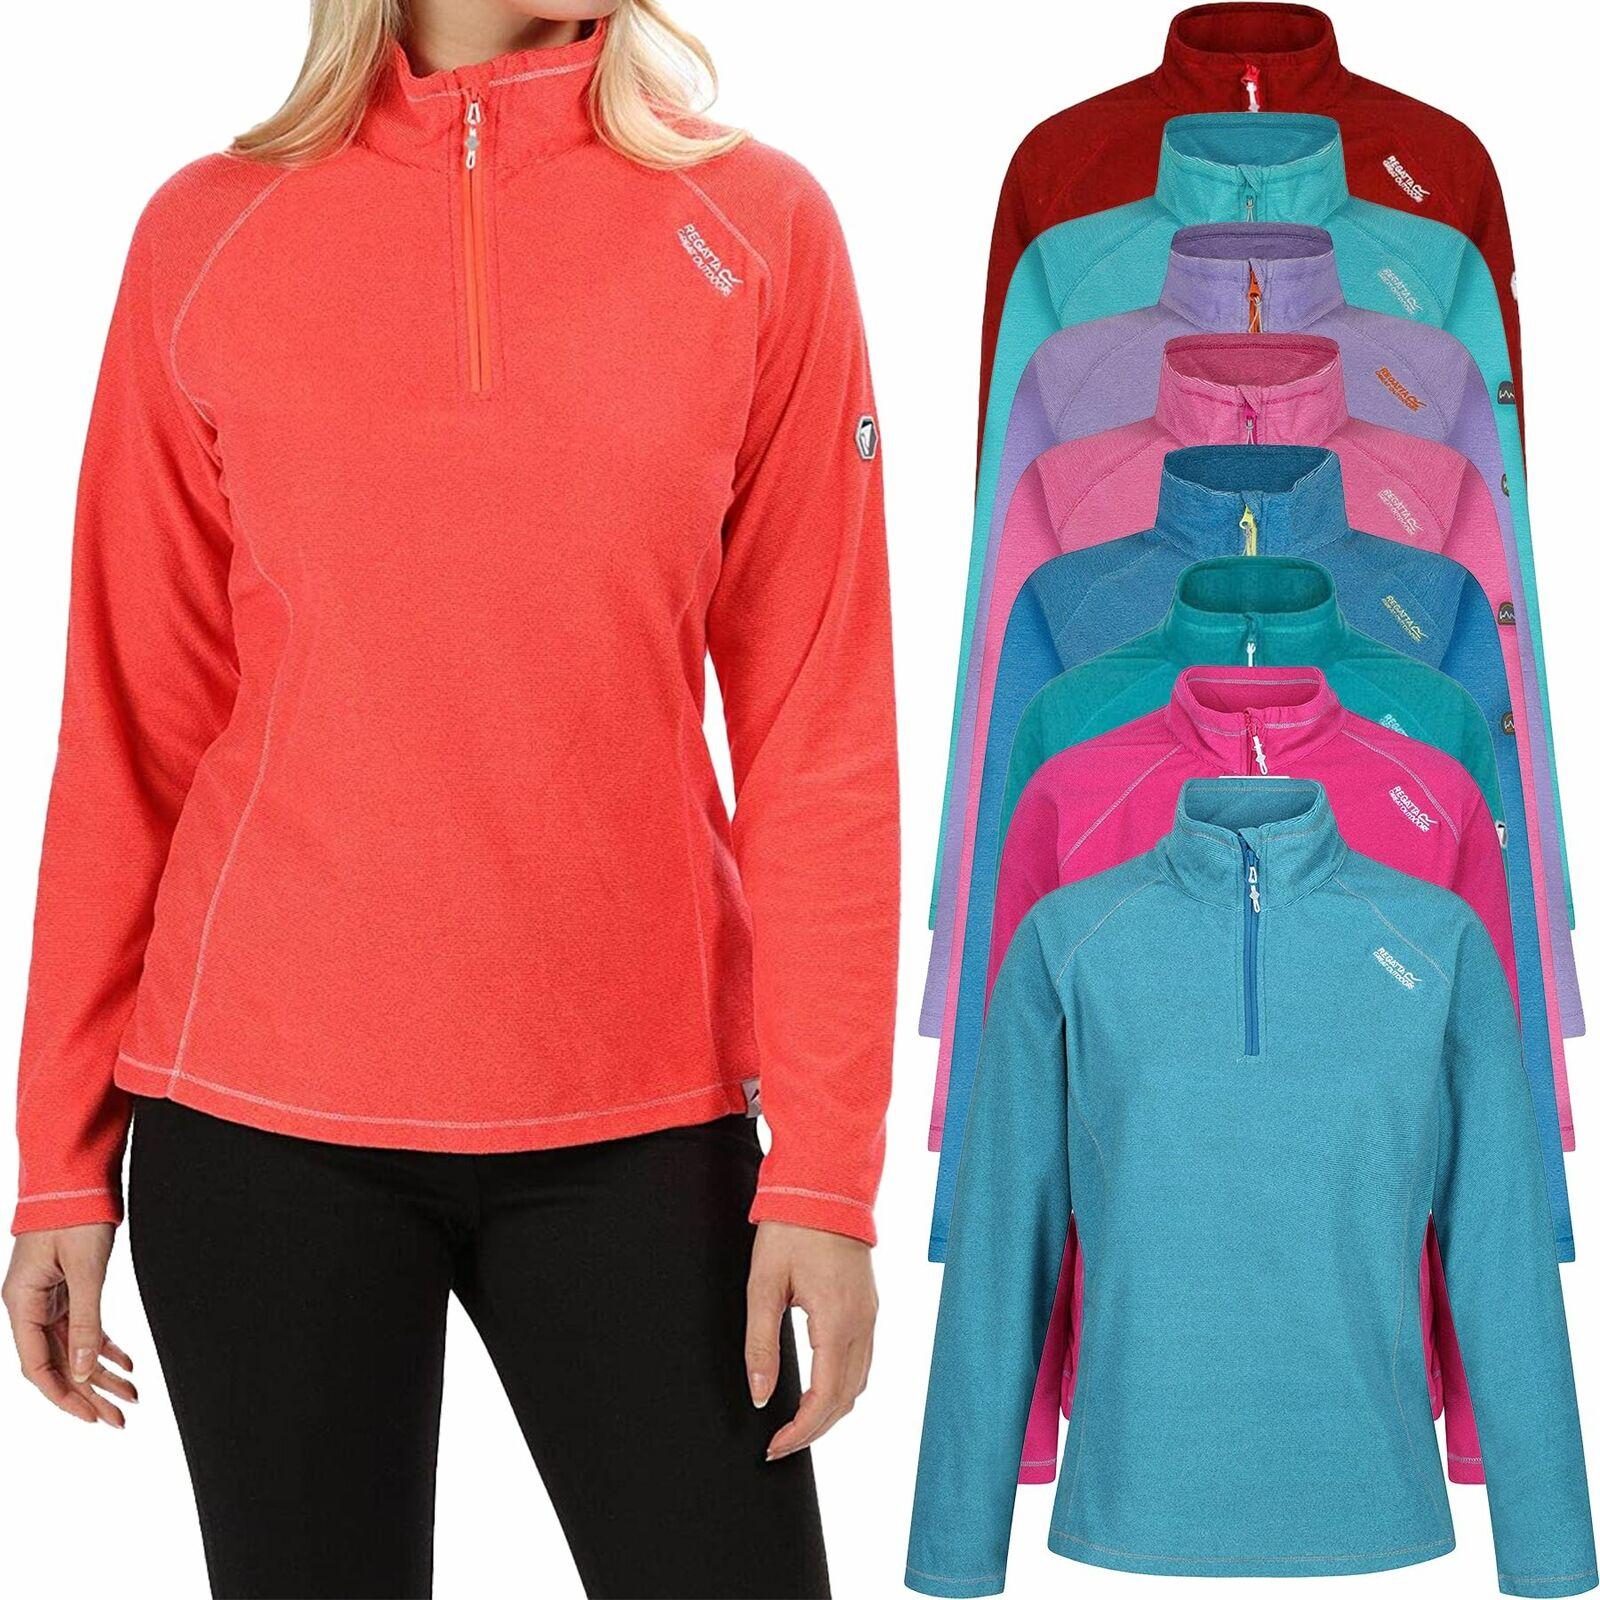 New Regatta Ladies Womens Montes Micro Fleece Half Contrast Zip Pullover 6-24